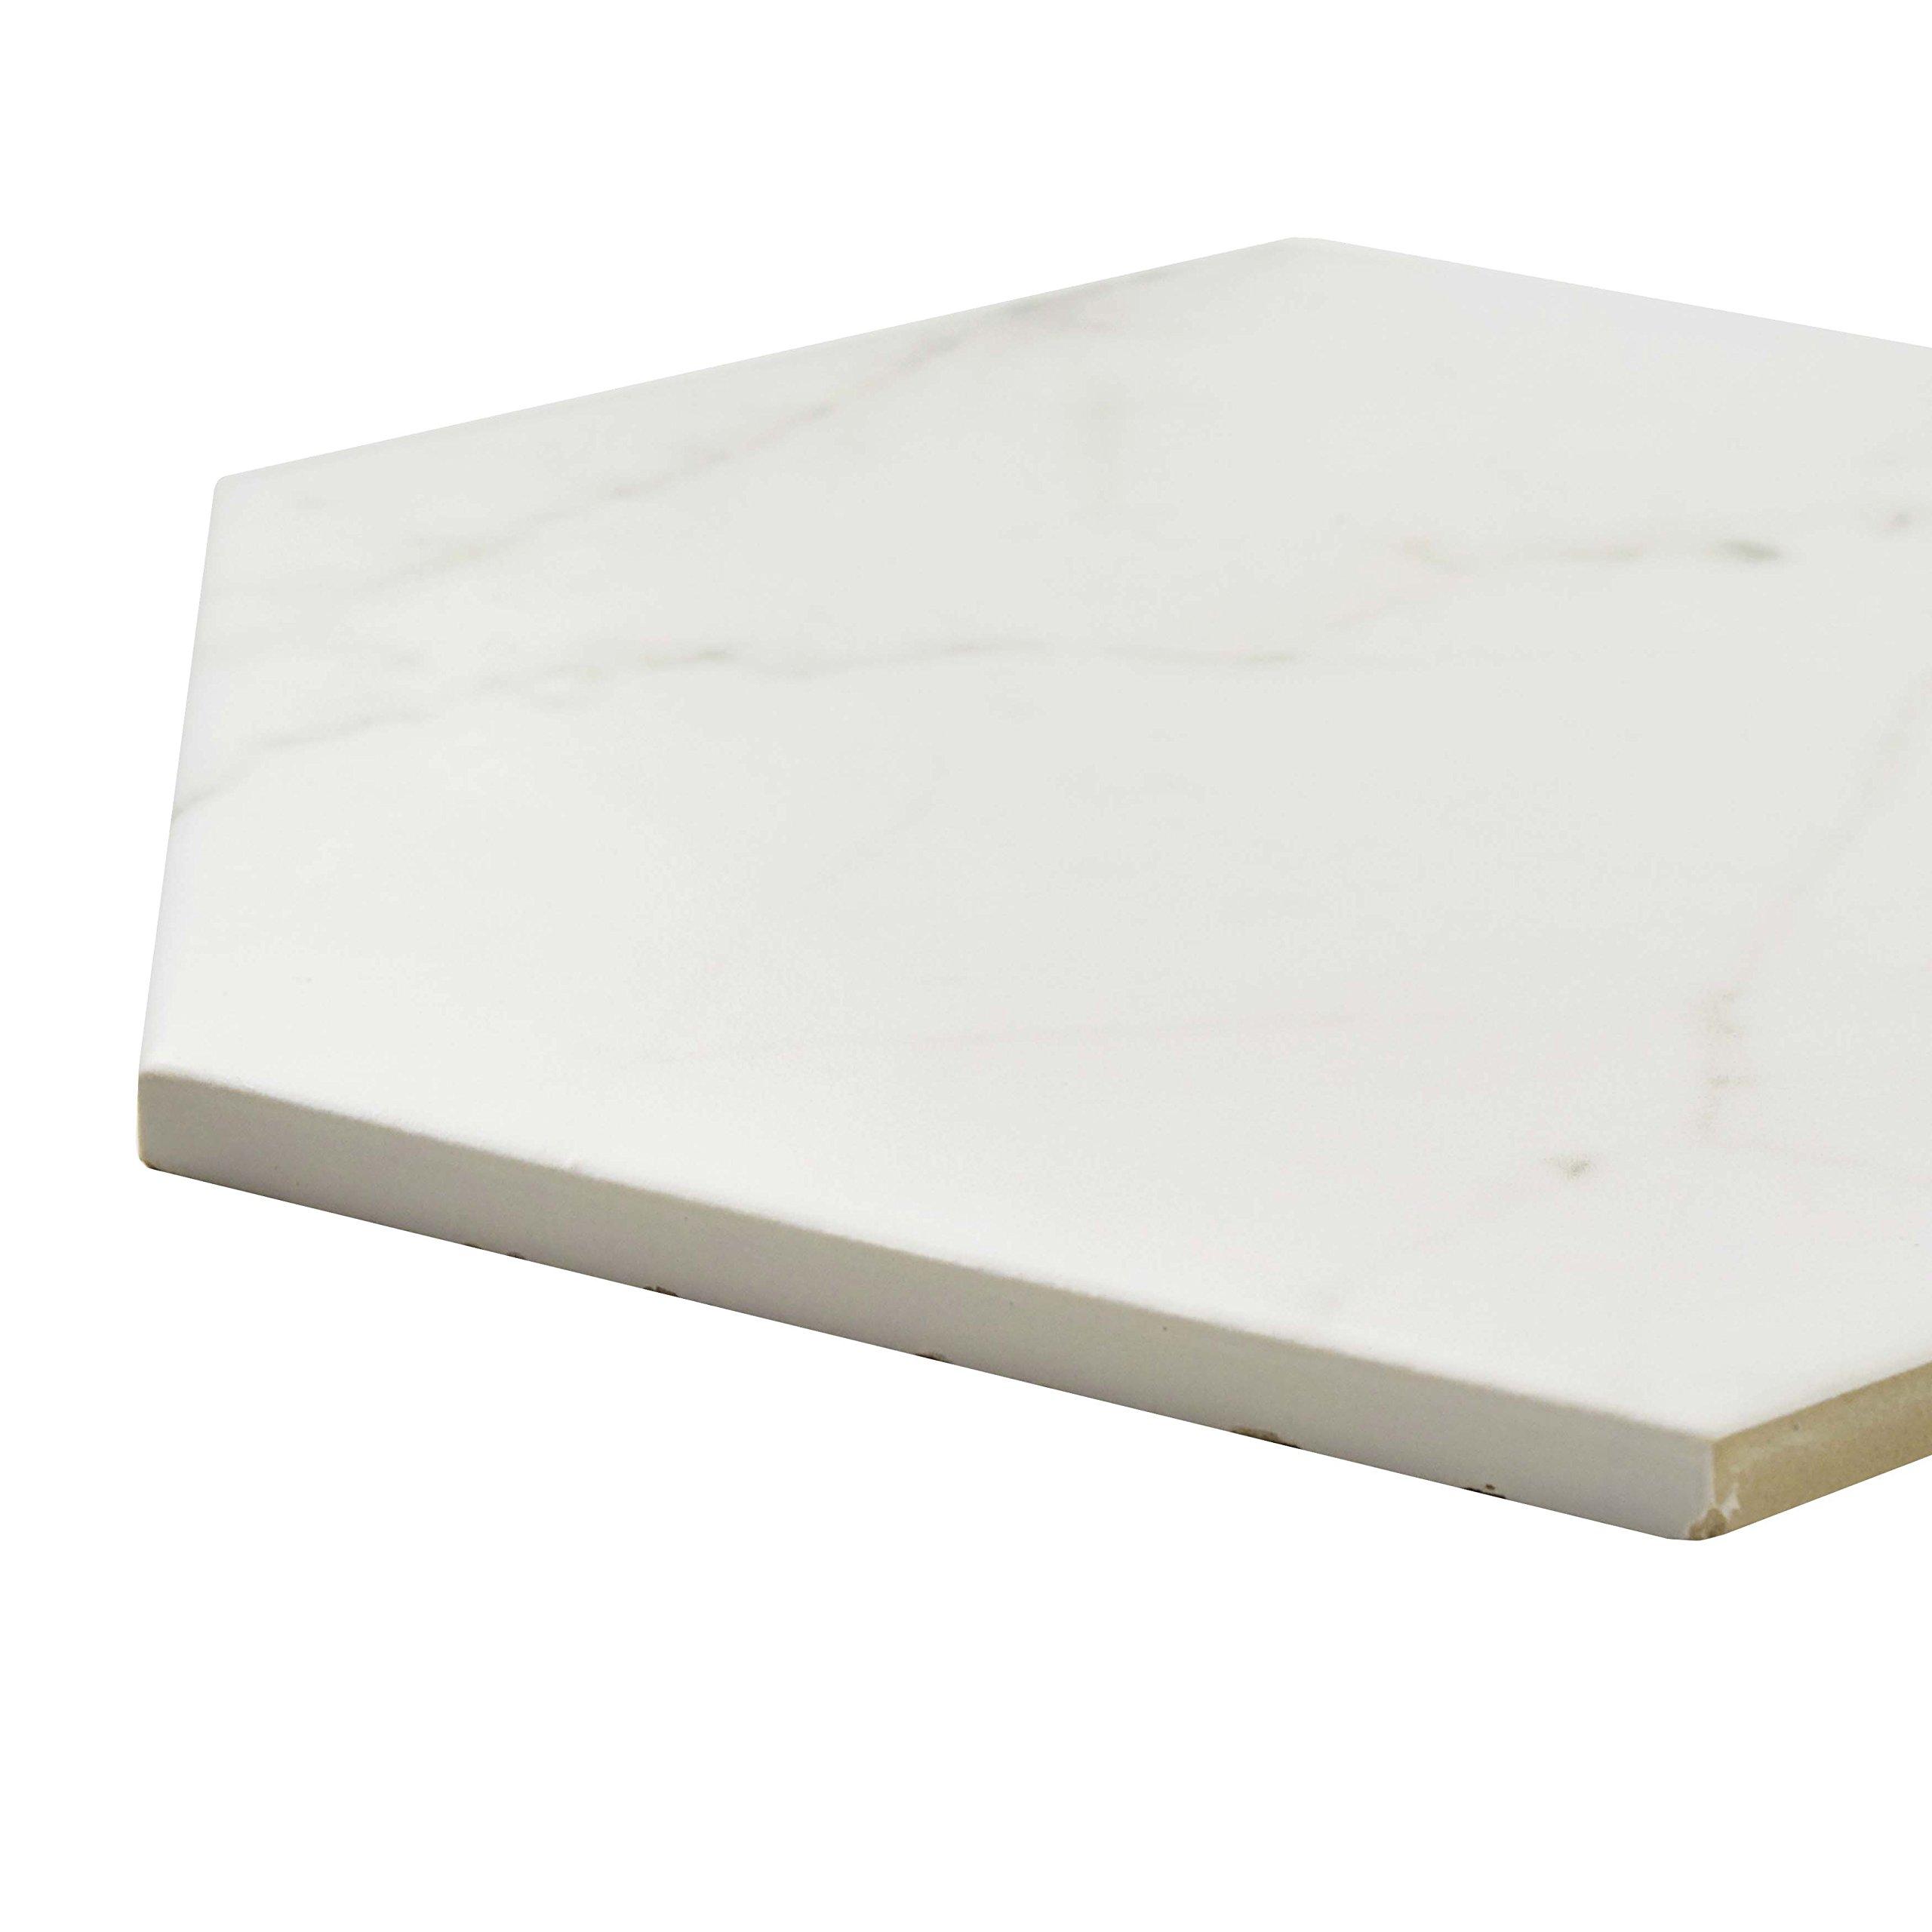 SomerTile FEQCRX Murmur Carrara Hexagon Porcelain Floor & Wall Tile, 7'' x 8'' (Pack of 25) by SOMERTILE (Image #6)